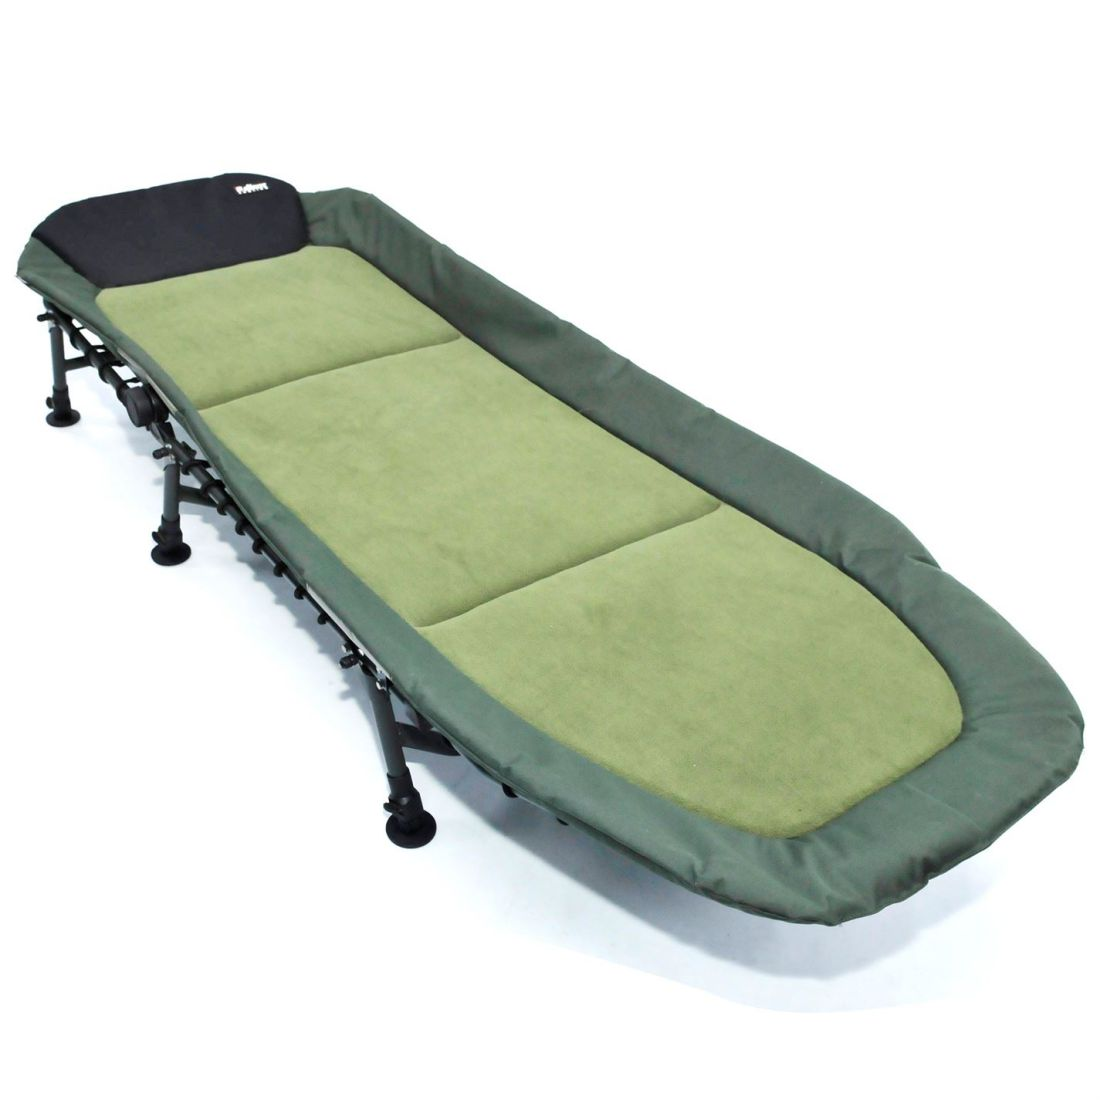 Diem D8 Bedchair 84 Unisex Fishing Chair